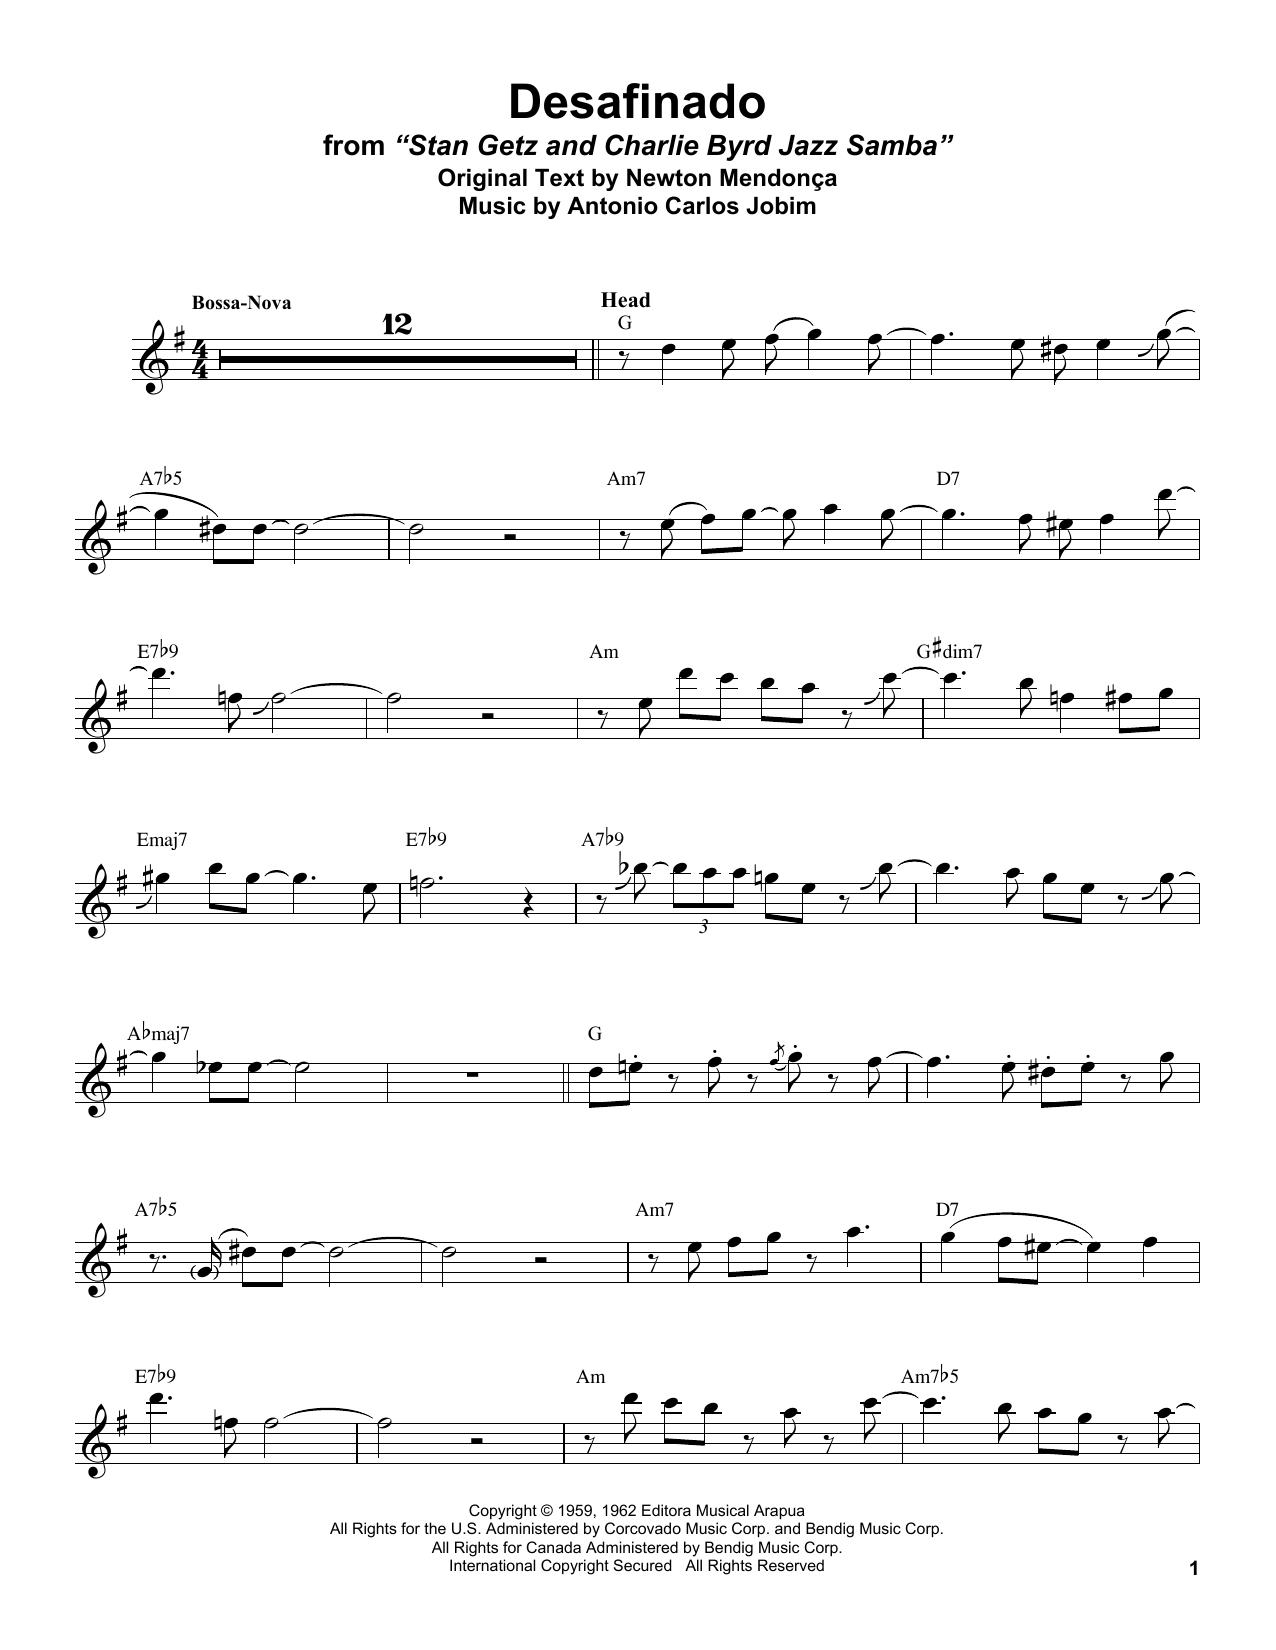 Stan Getz Desafinado sheet music notes and chords. Download Printable PDF.